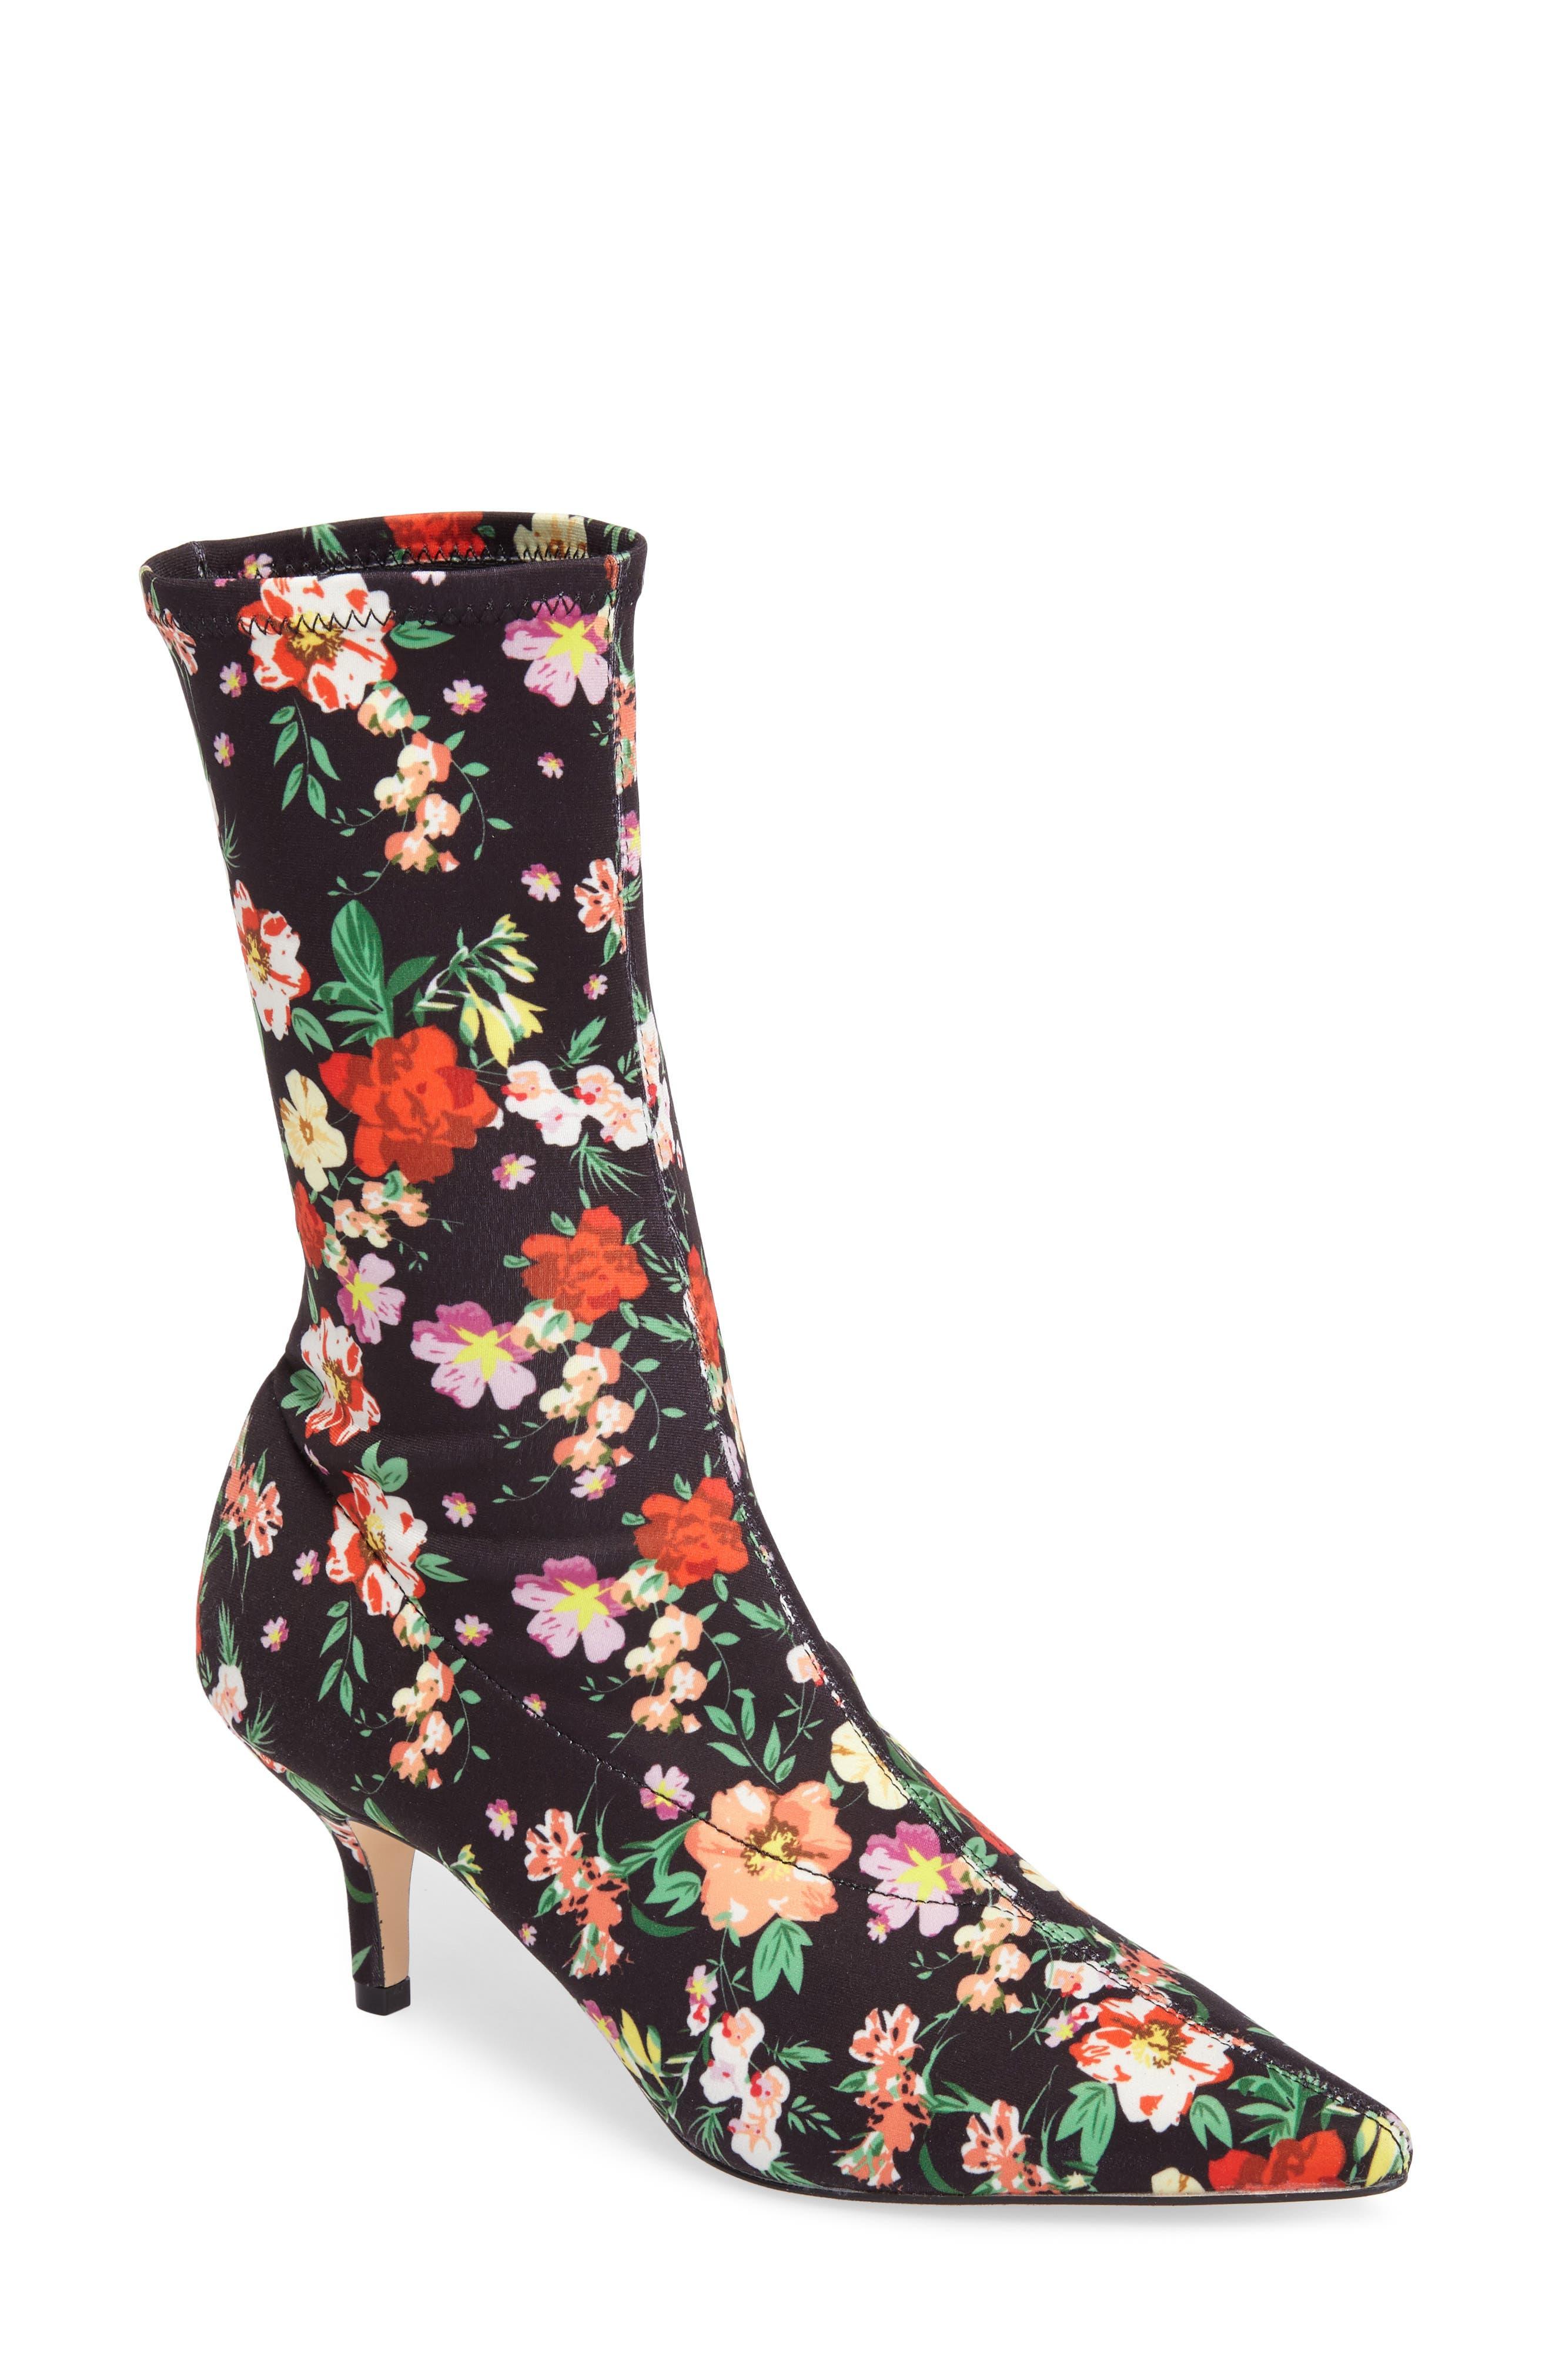 Main Image - Steve Madden Ramone Floral Sock Bootie (Women) (Narrow Calf)